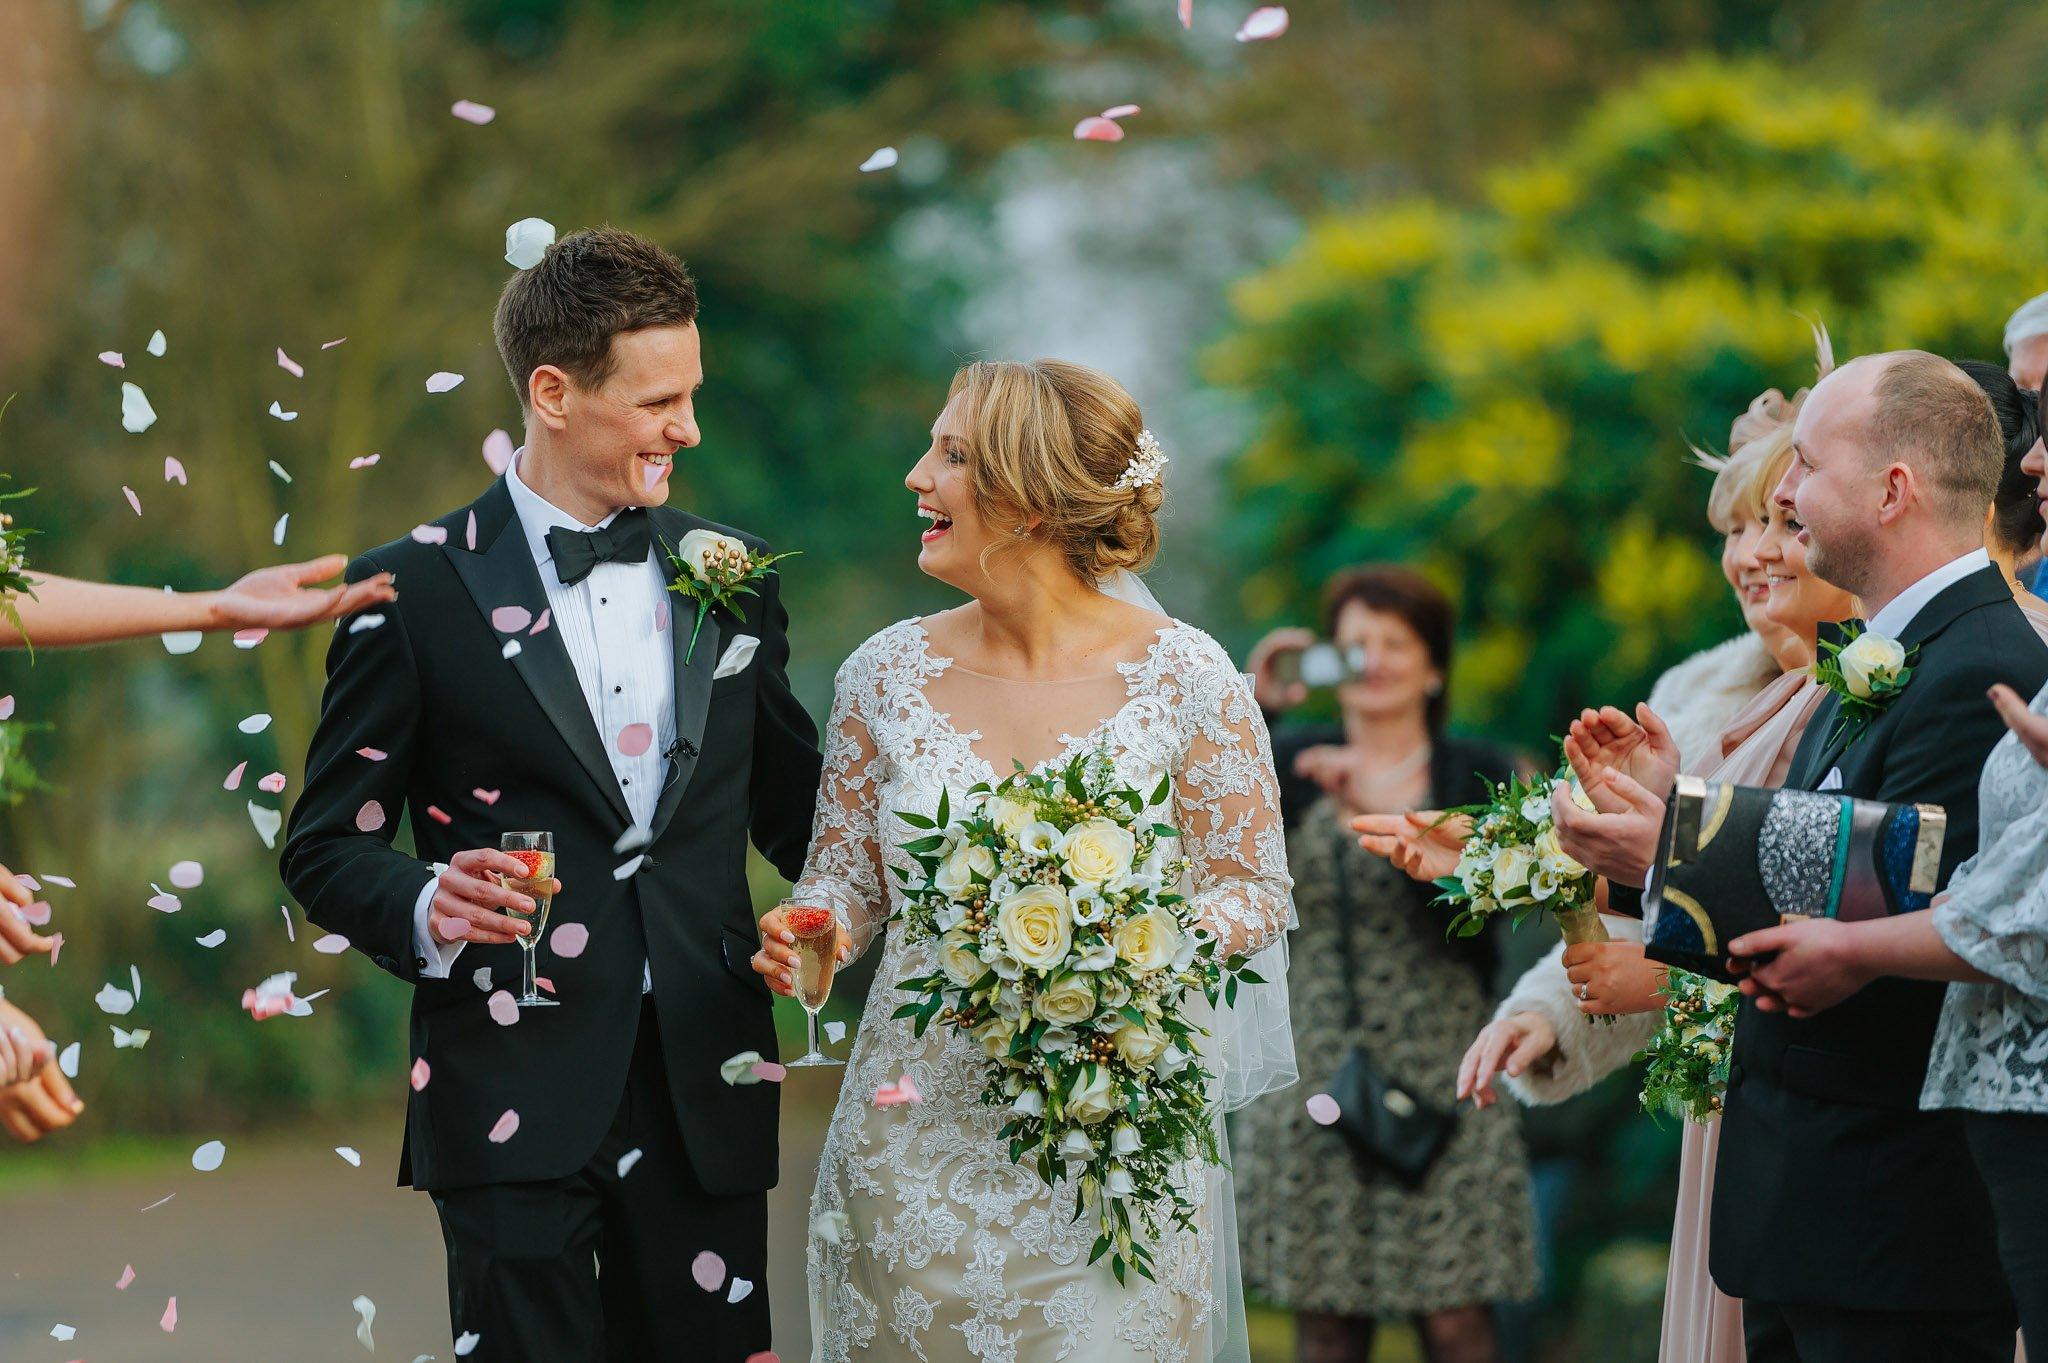 Coombe Abbey wedding in Coventry, Warwickshire - Sam + Matt 22